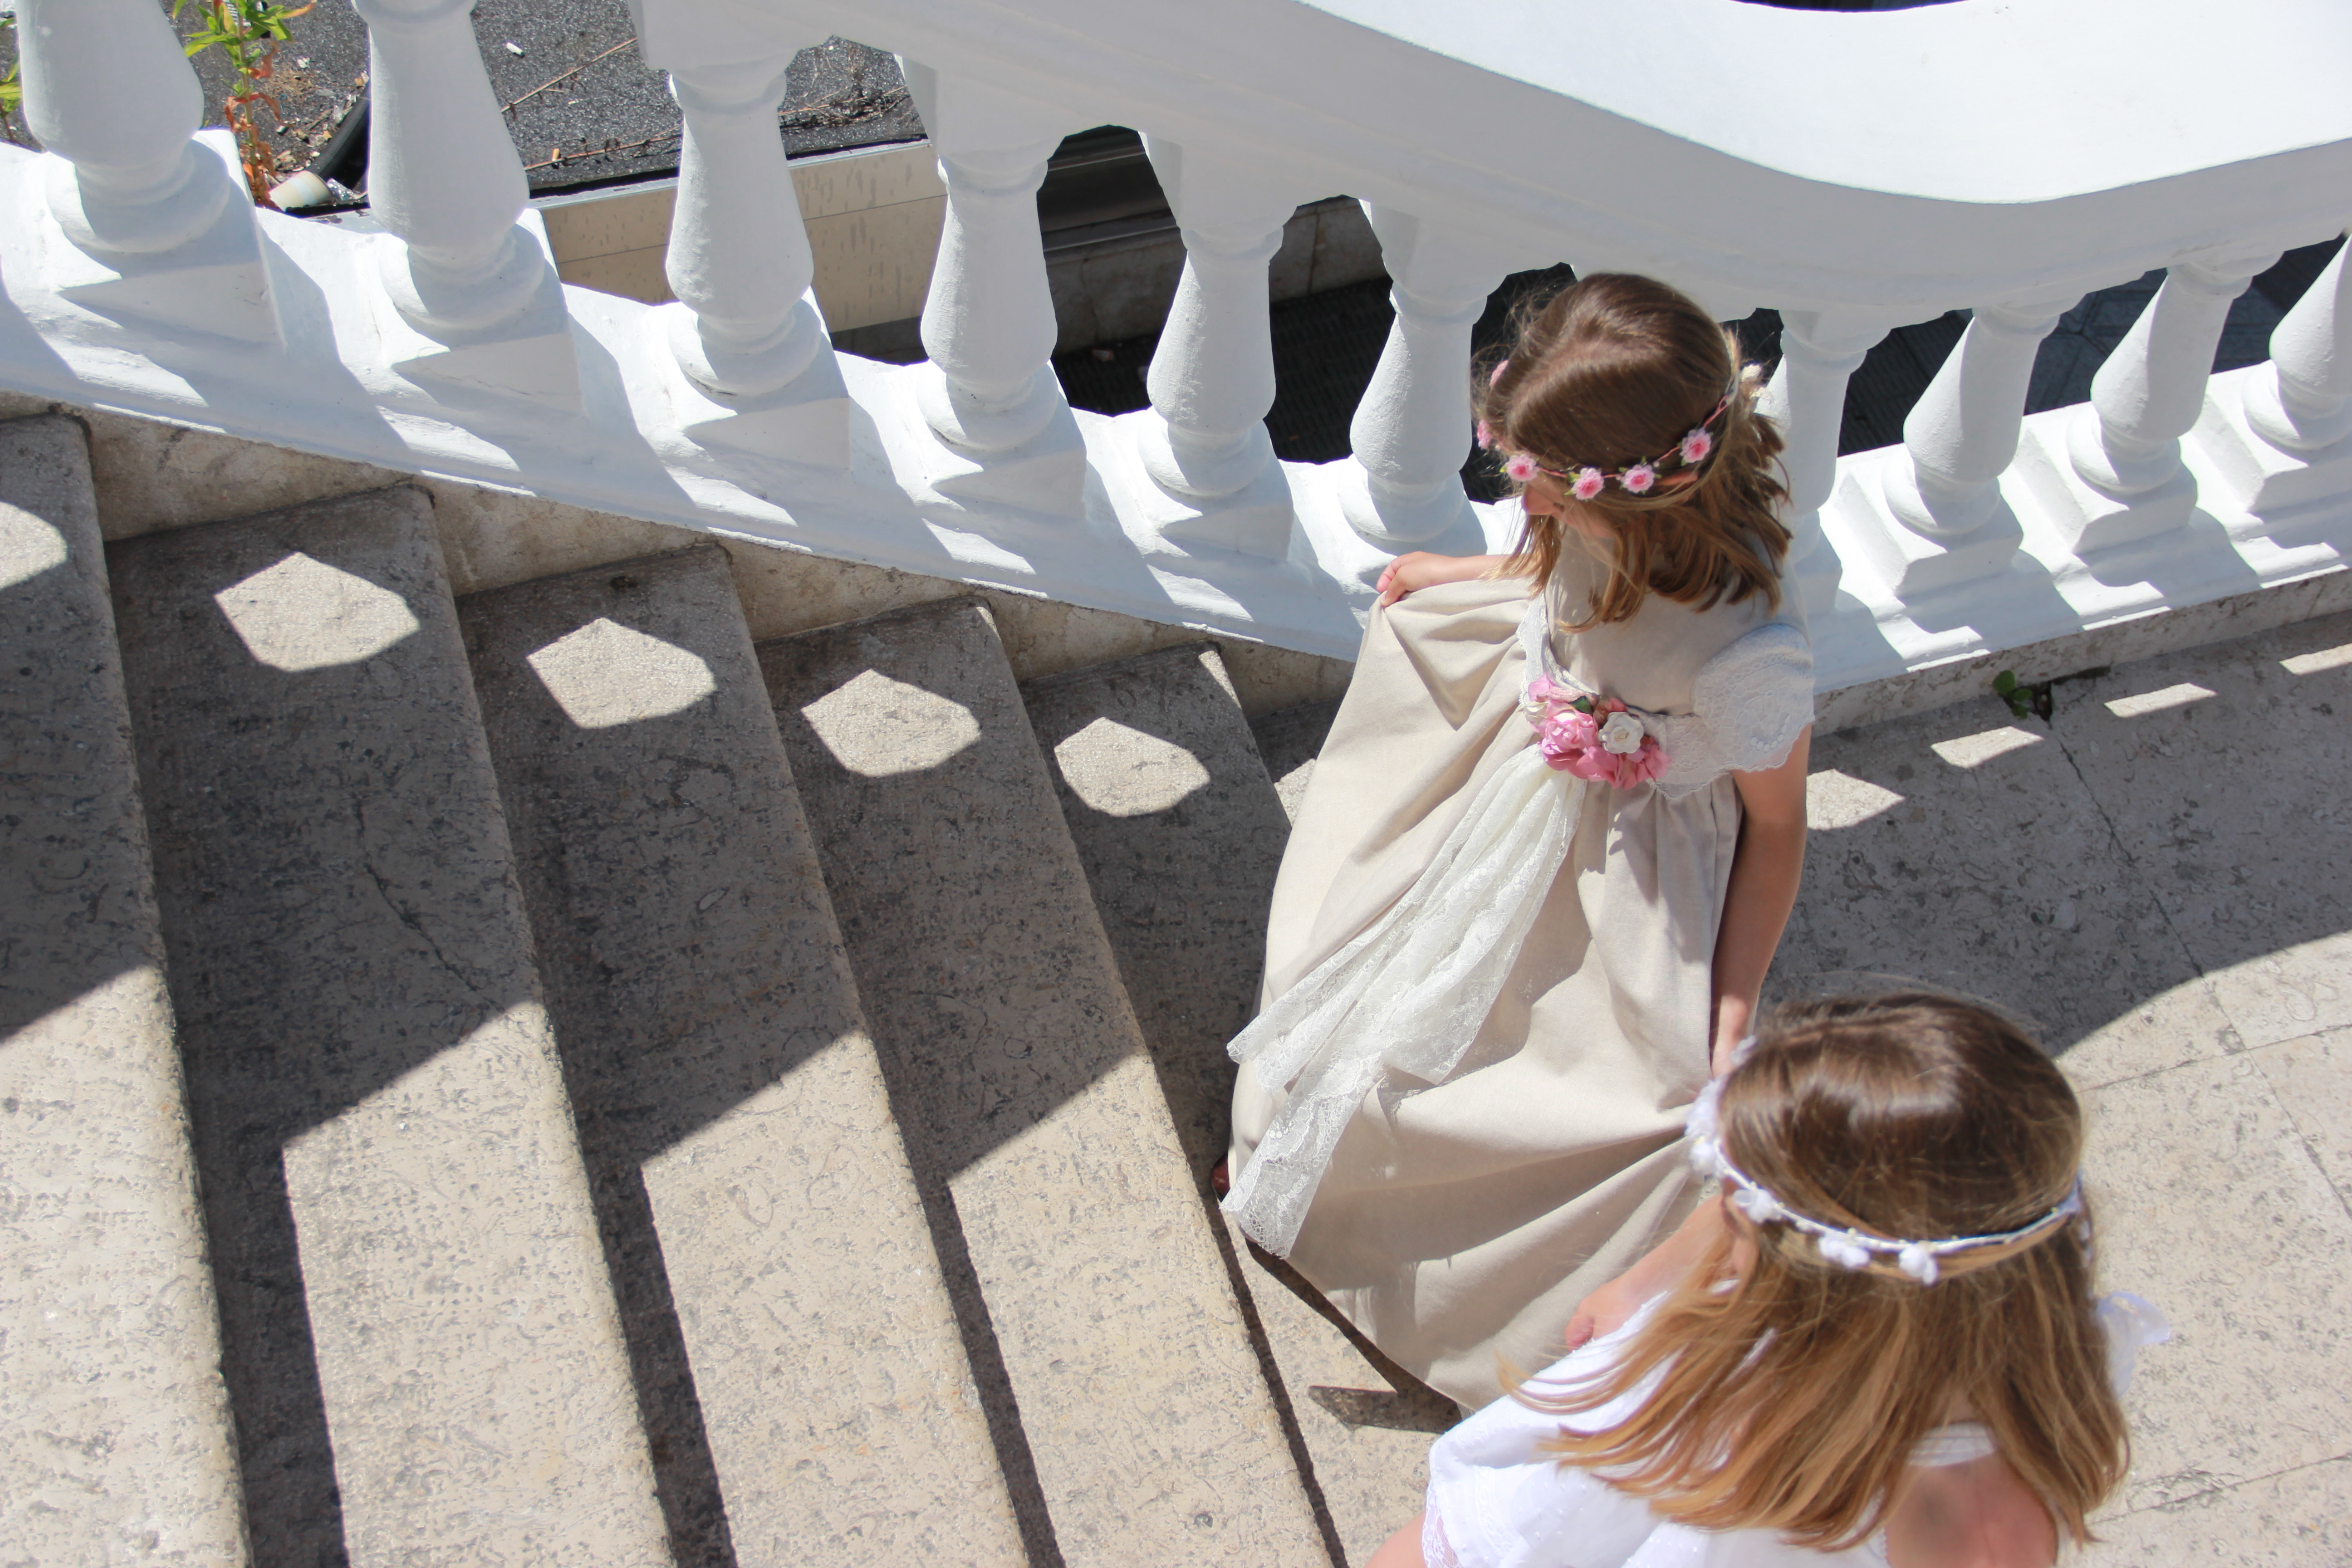 niñas con estilo, moda infantil estilosa,vestido de comunion, comunion 2017, arras online, alta costura niños, ropa de ceremonia infantil a medida, ceremonia infantil (8) - copia